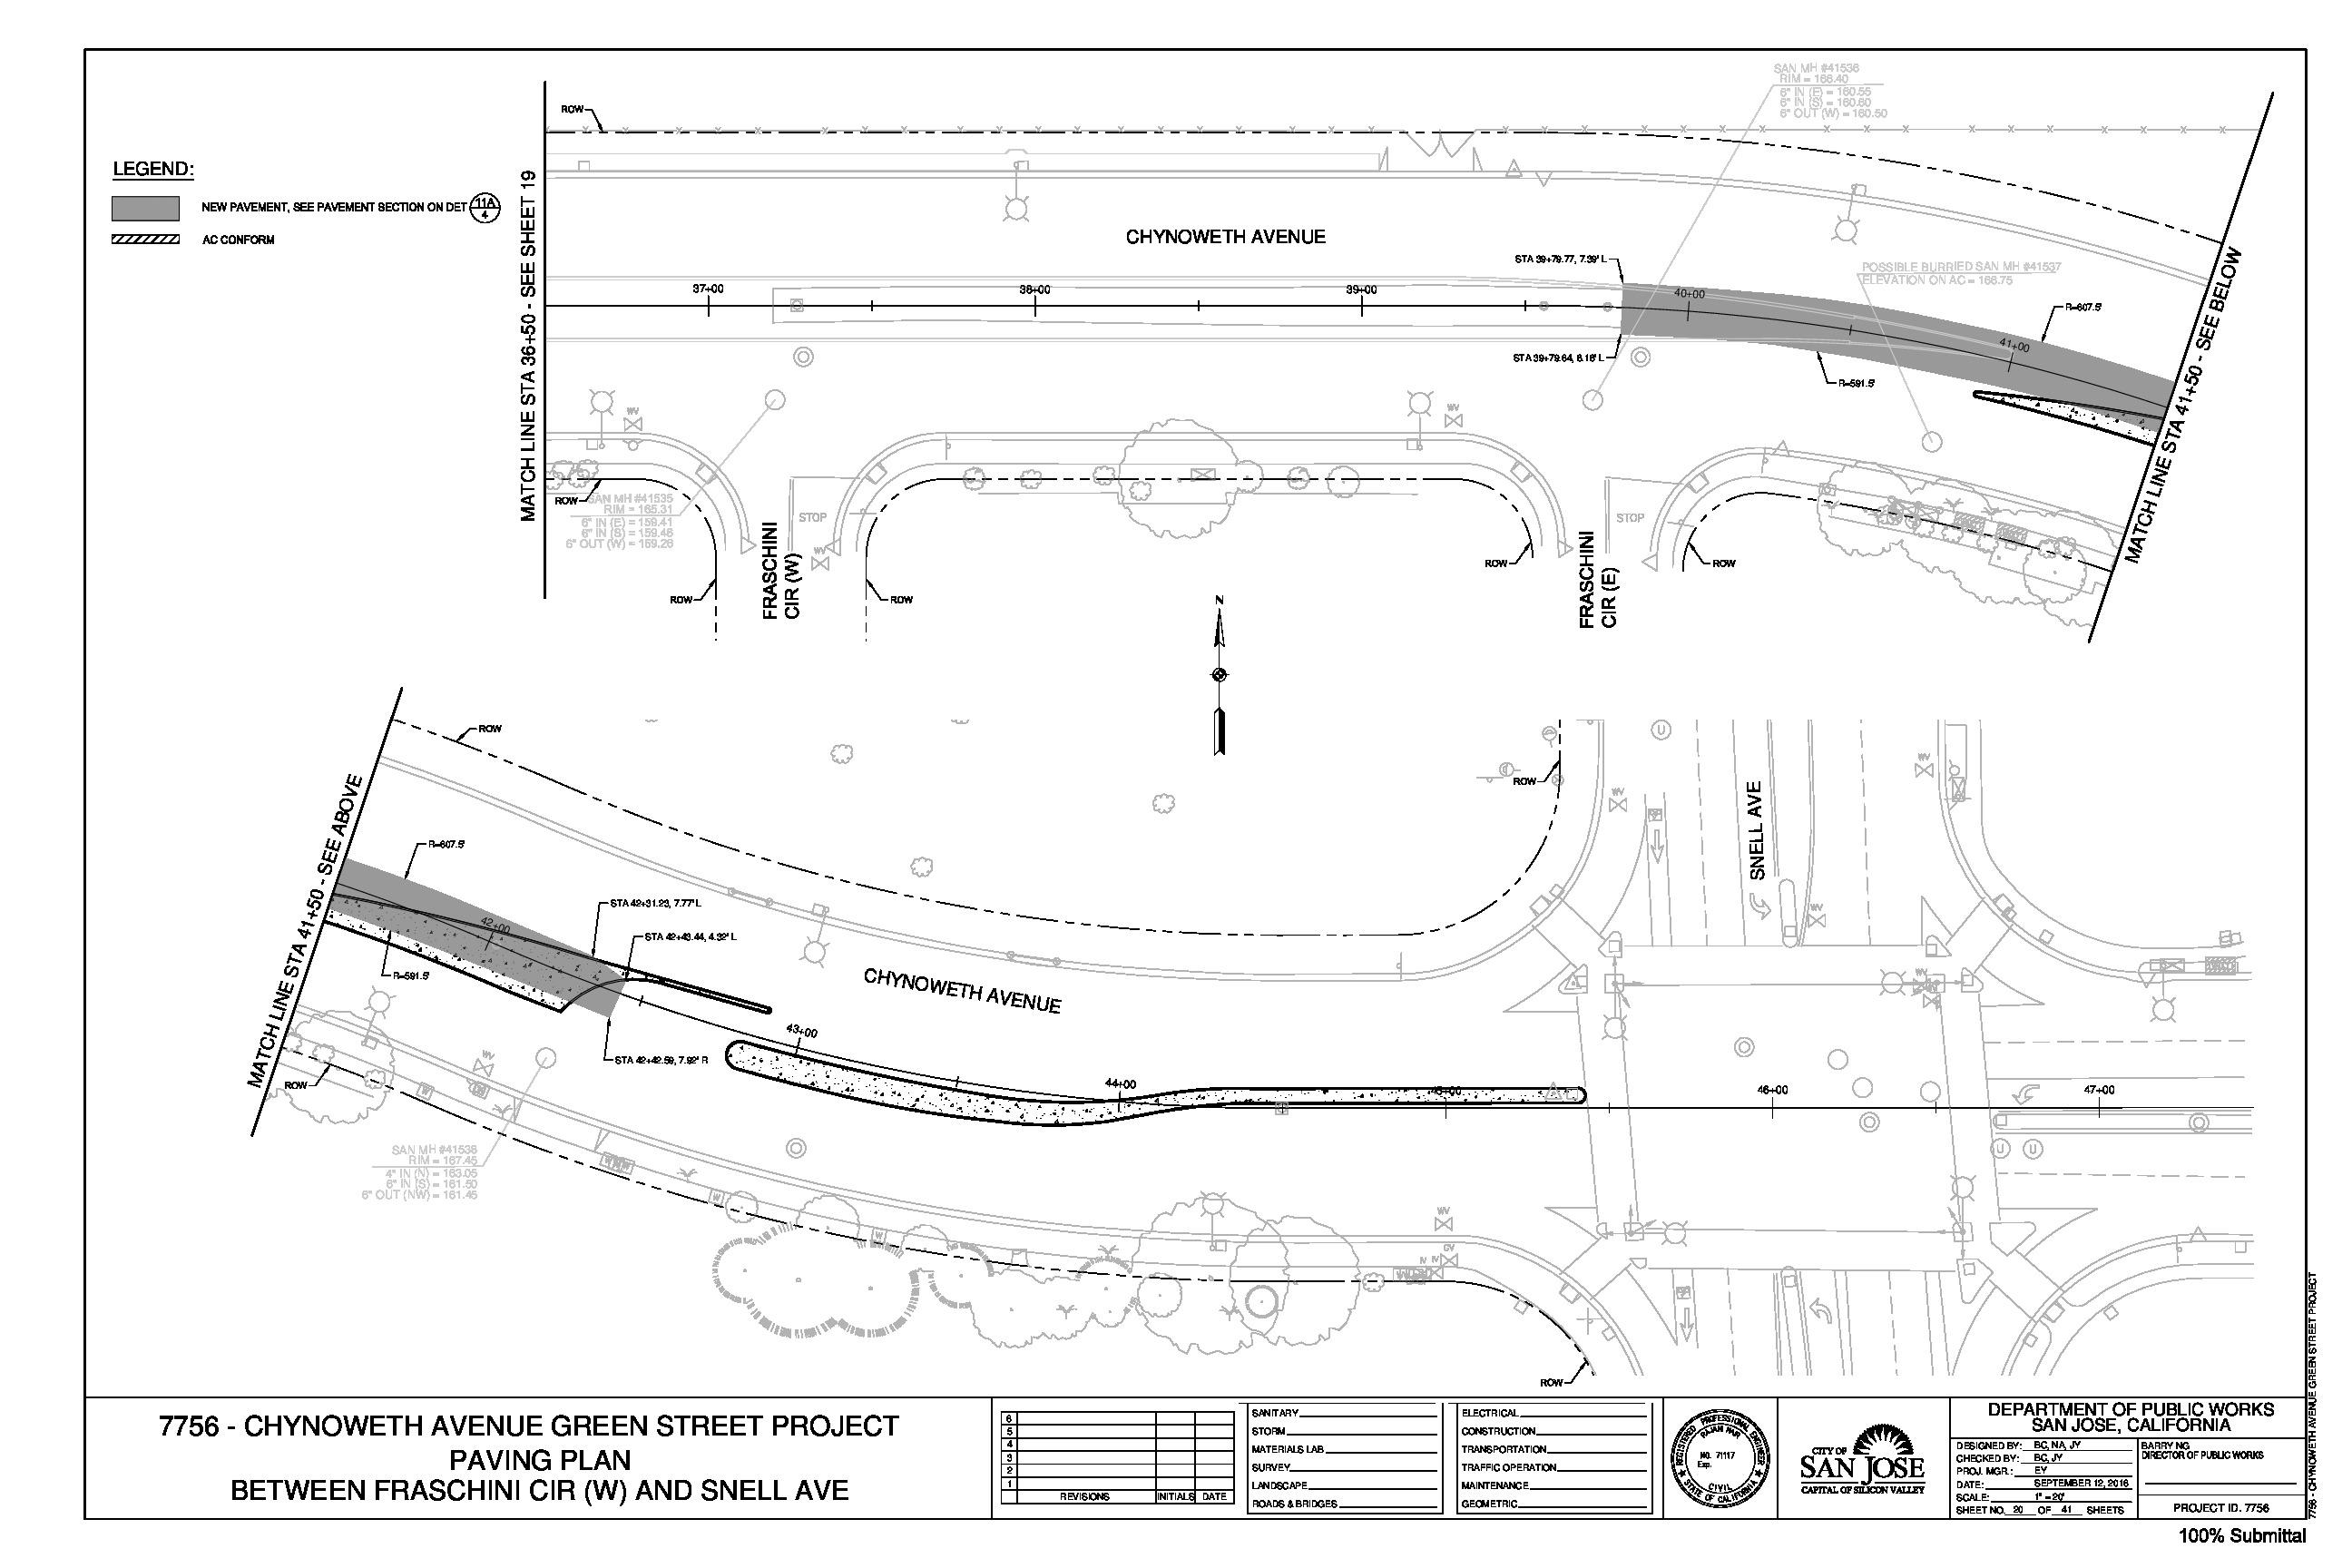 Chynoweth Avenue Green Street Project Plans